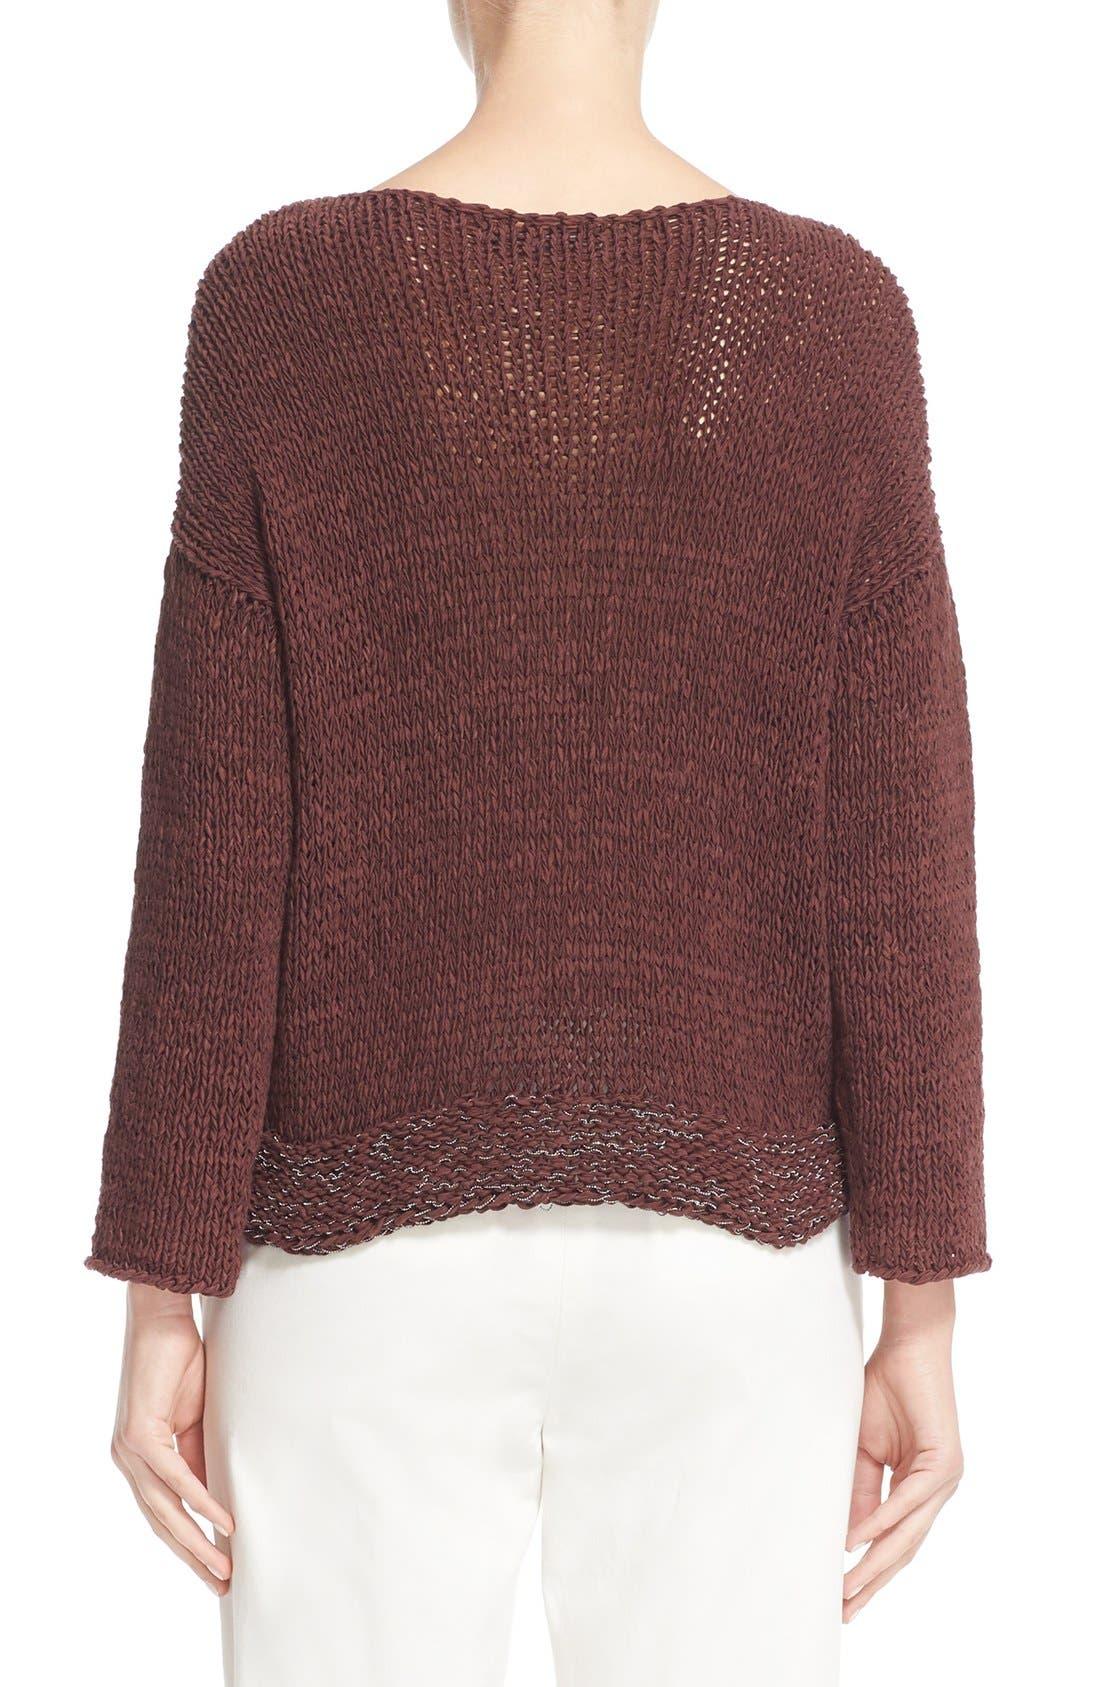 Alternate Image 2  - Fabiana Filippi Mollini Trim Cotton Blend Sweater